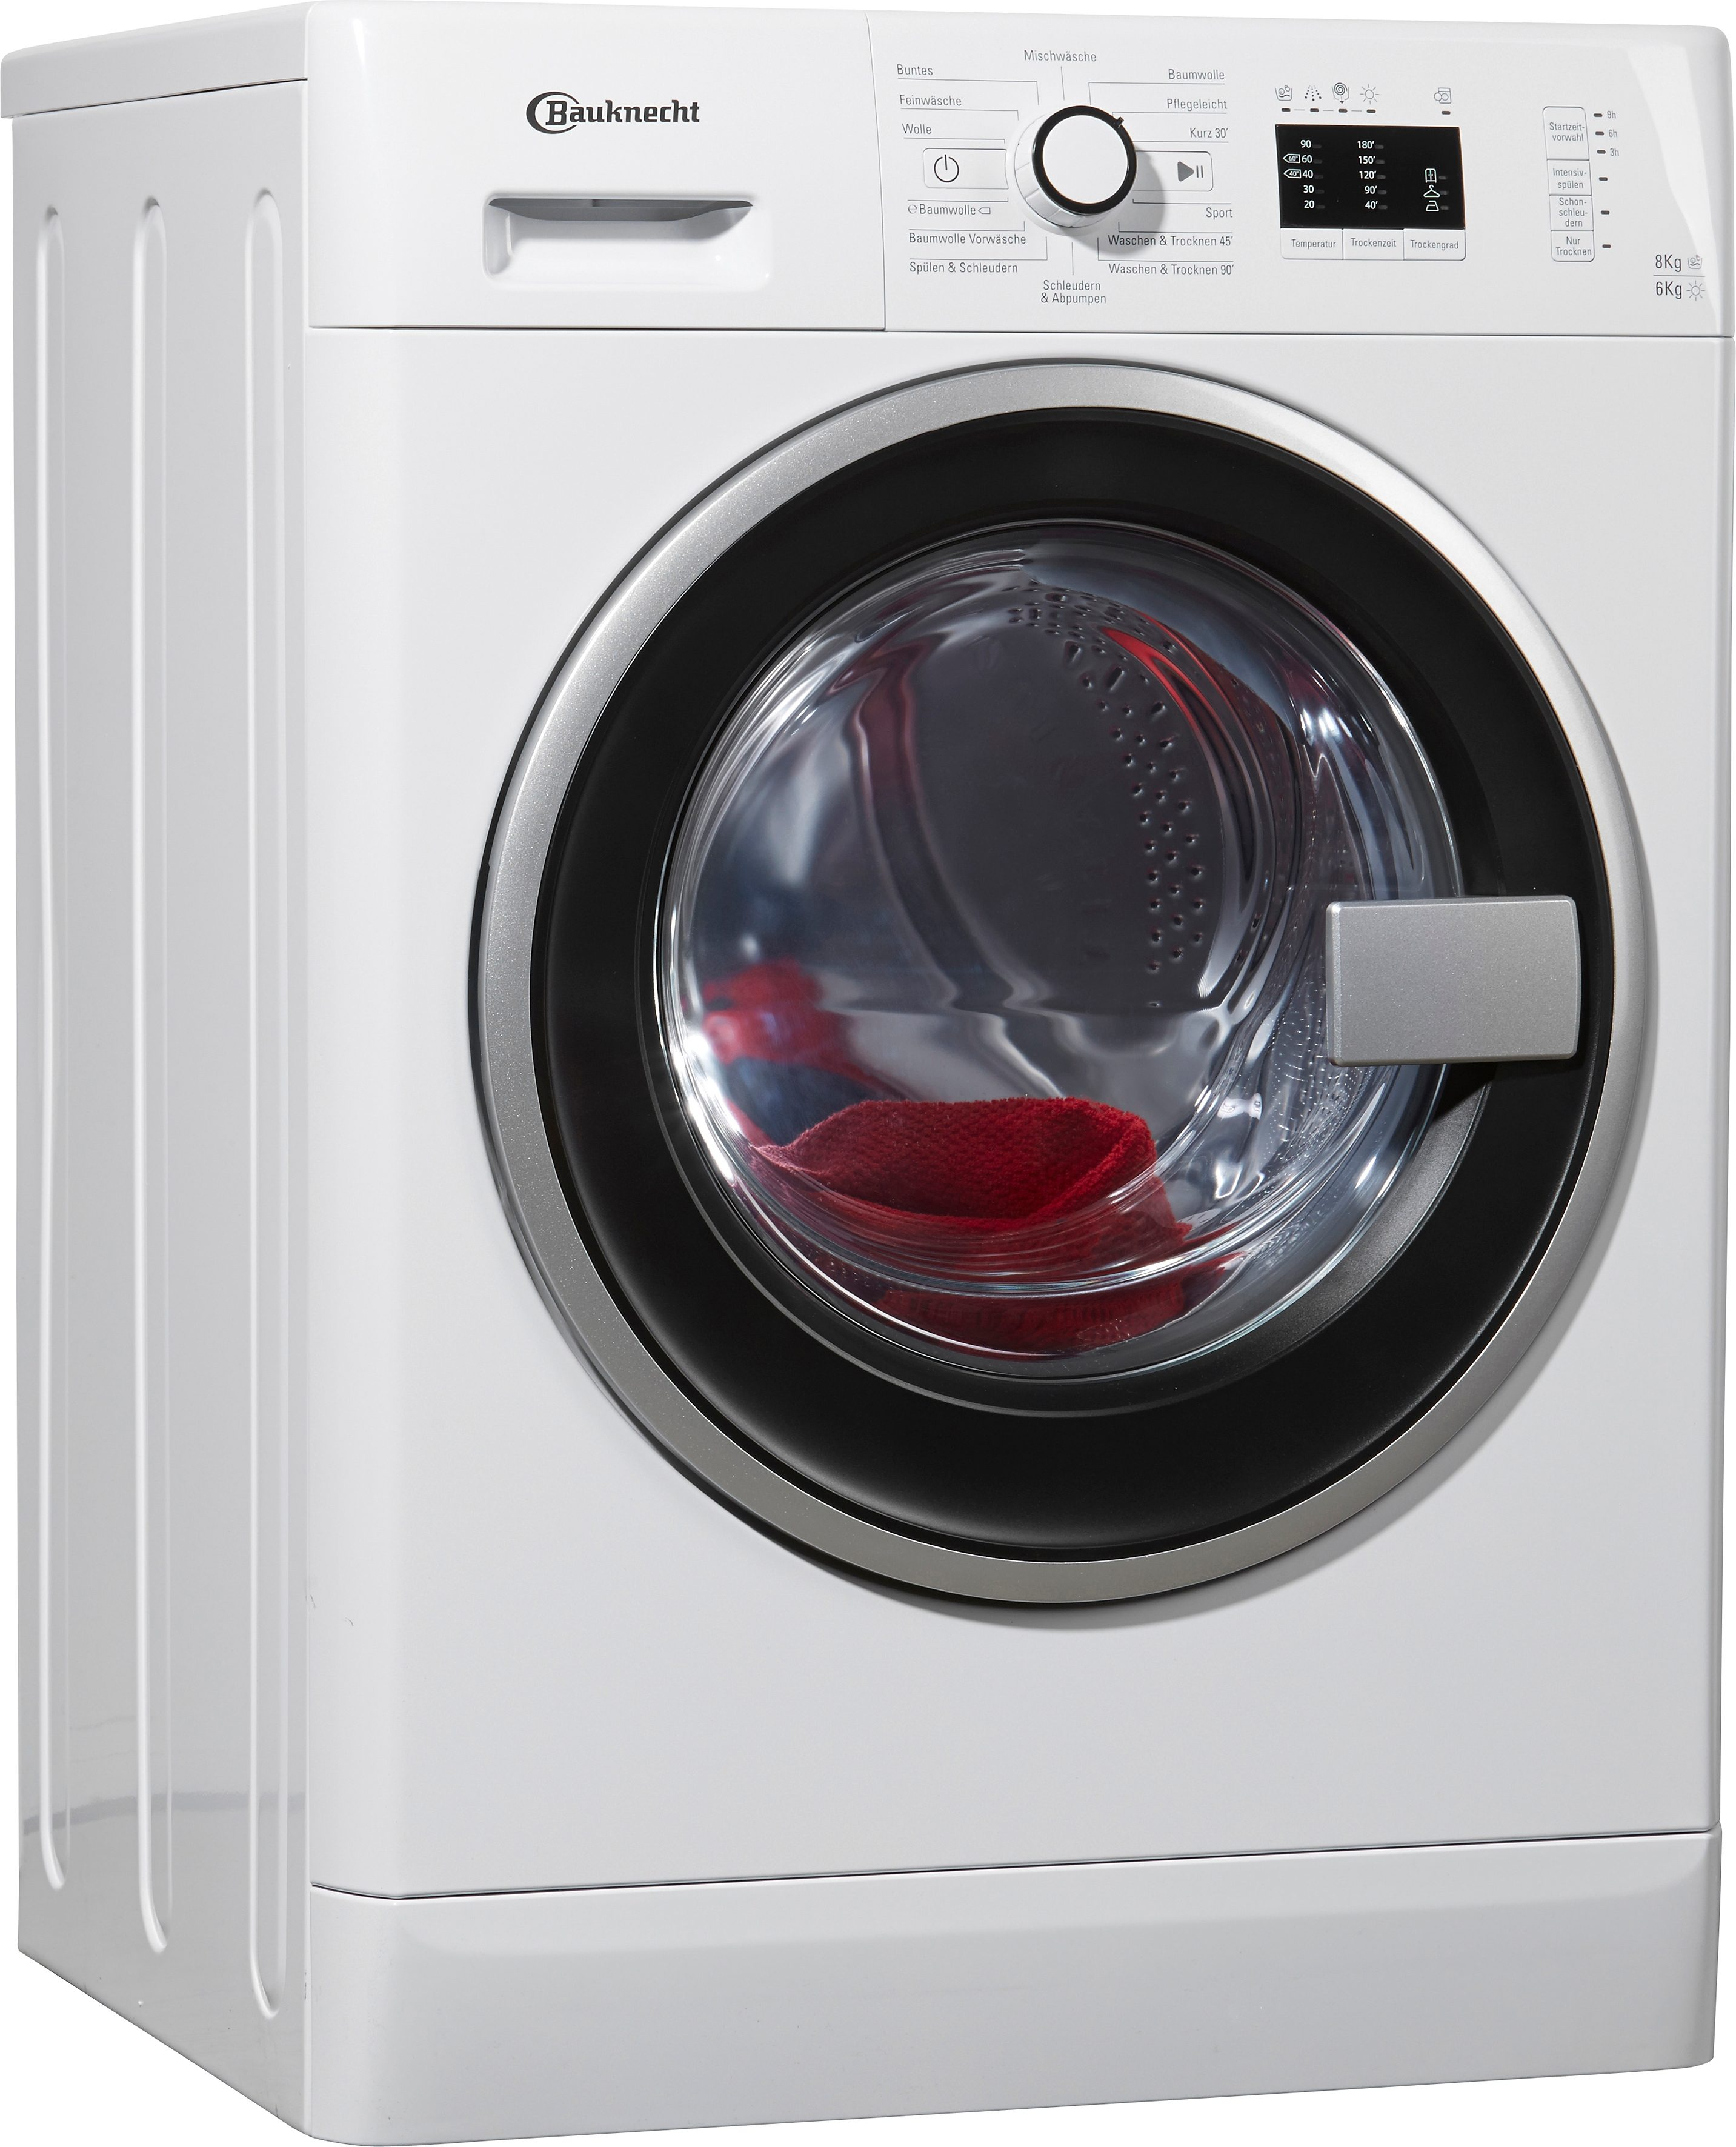 BAUKNECHT Waschtrockner WATK Prime 8612, A, 8 kg / 6 kg, 1200 U/Min